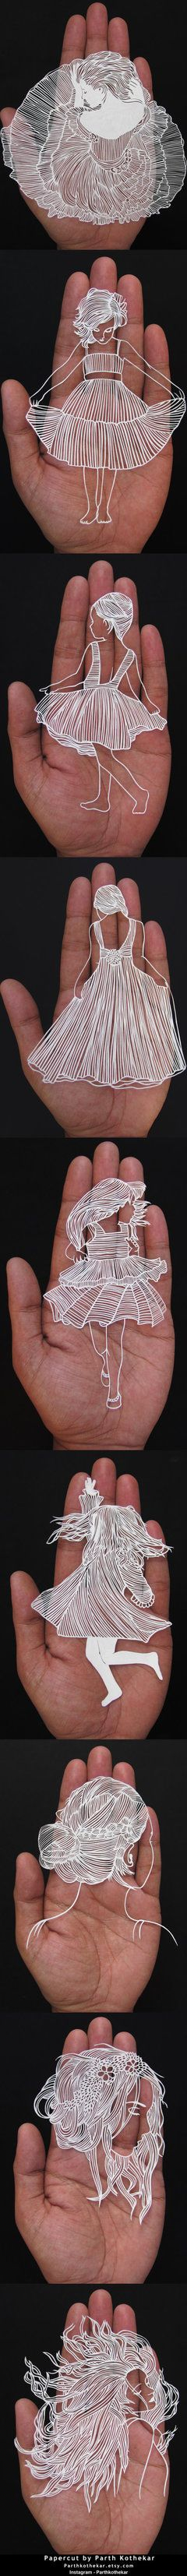 Papercut by Parth Kothekar - papercuts - paper by ParthKothekar.deviantart.com on @DeviantArt